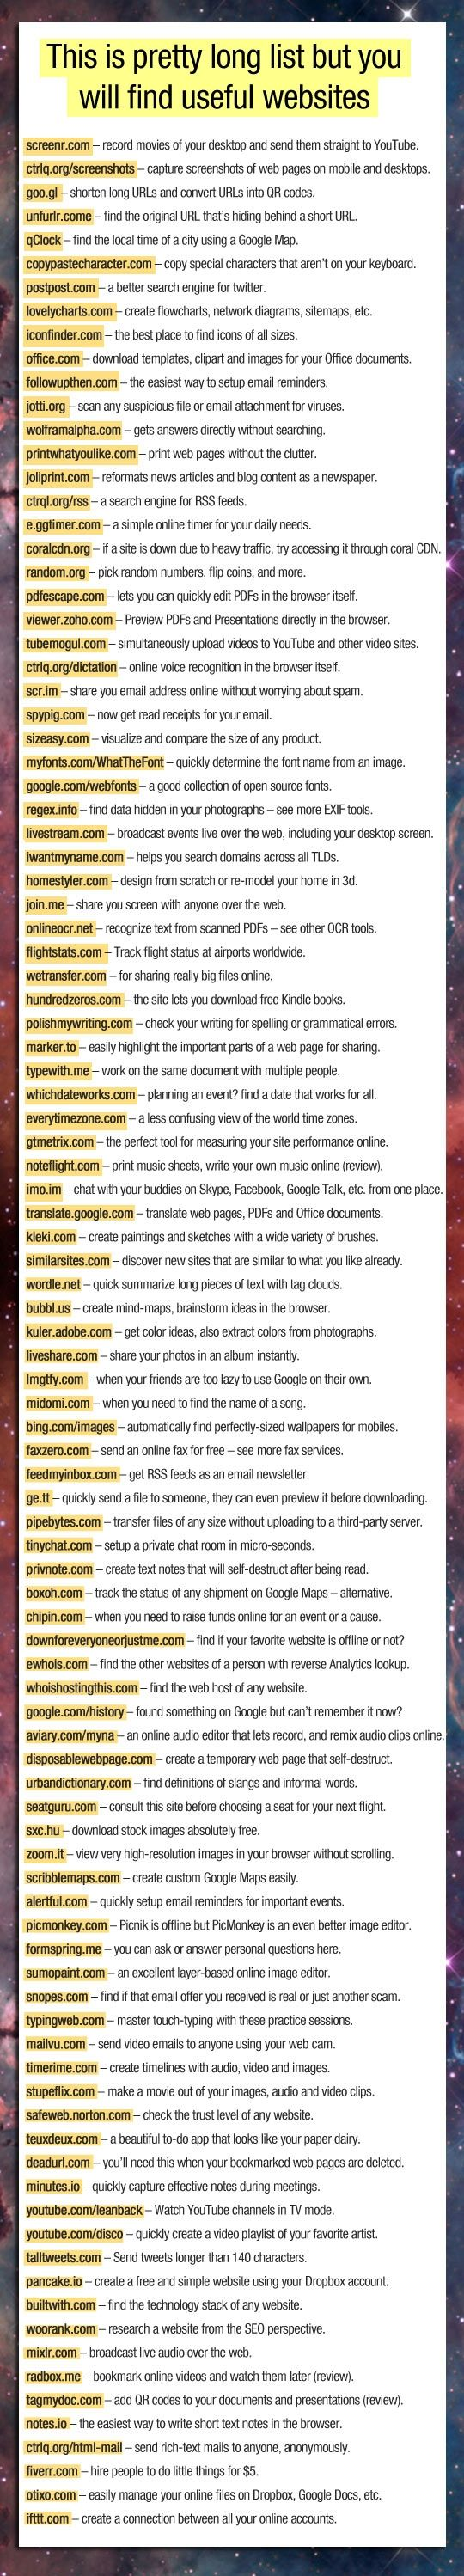 cool-list-useful-websites-Internet by echkbet